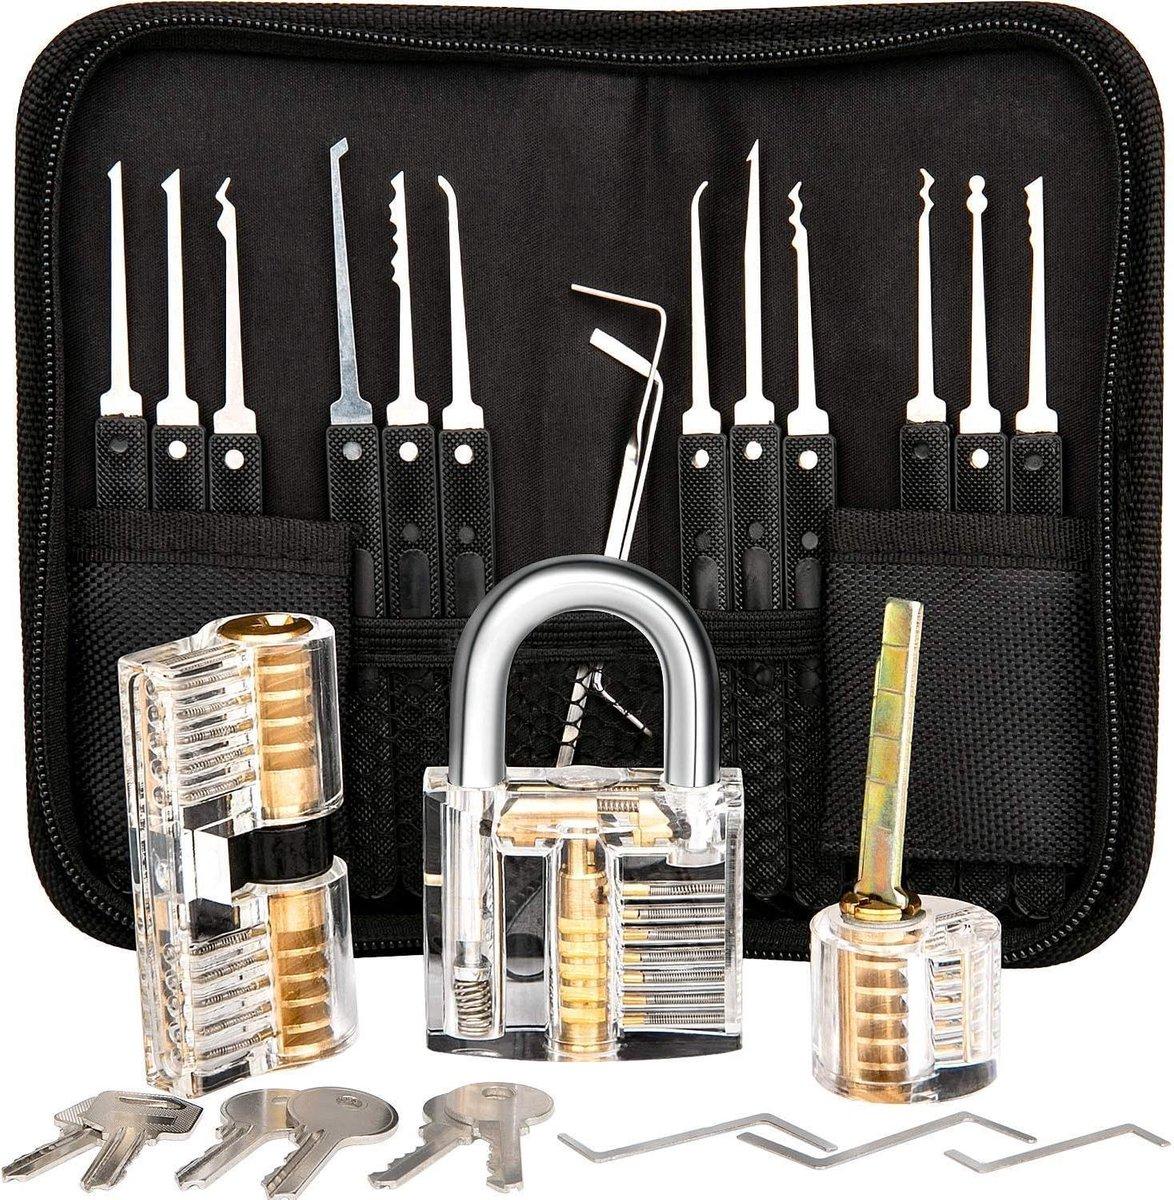 Uitgebreide Lockpick Set met 3 sloten - Lockpicking - Lock pick gereedschap tools - Lockpicken voor